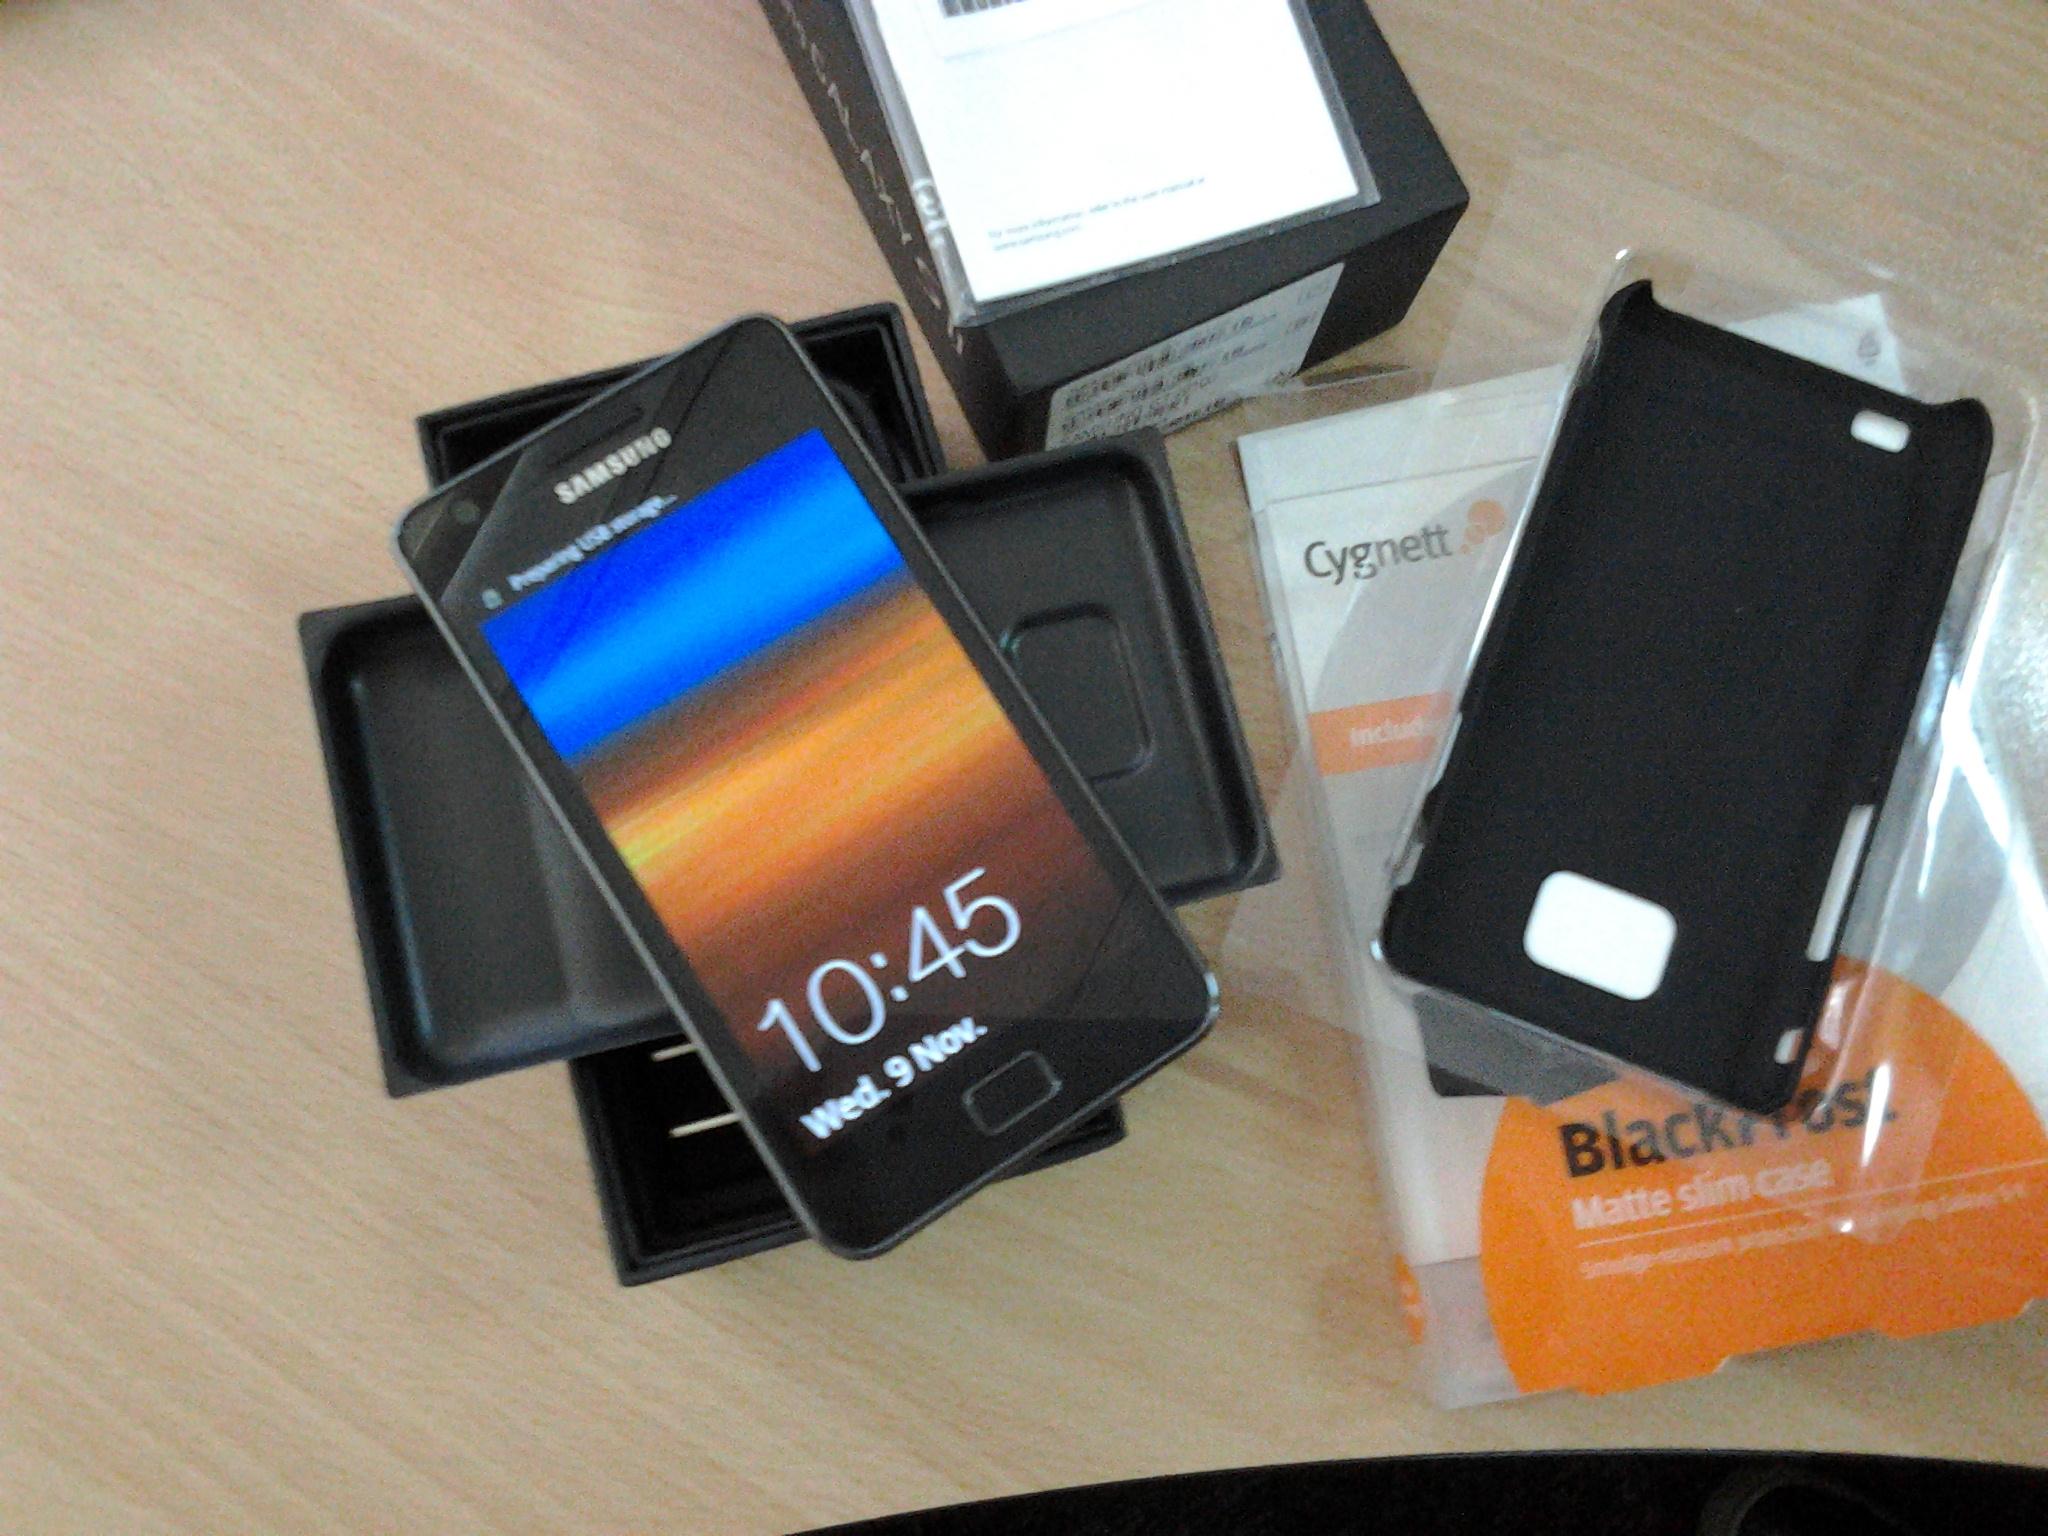 Unboxing Samsung Galaxy S II